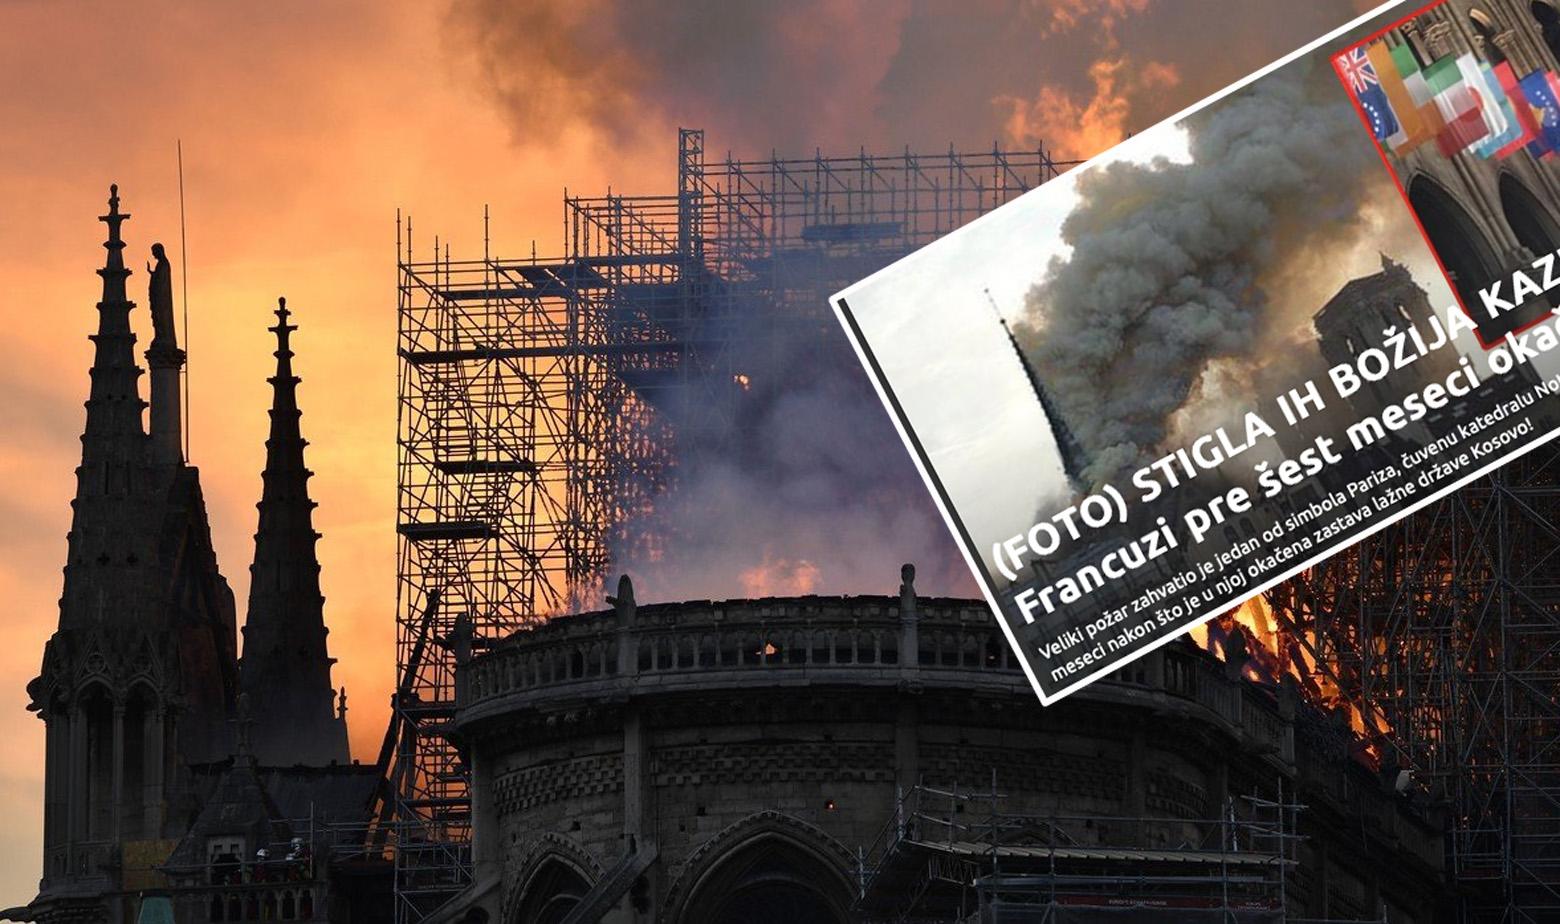 Notre-Dame u plamenu i naslovnica Informera sa strane